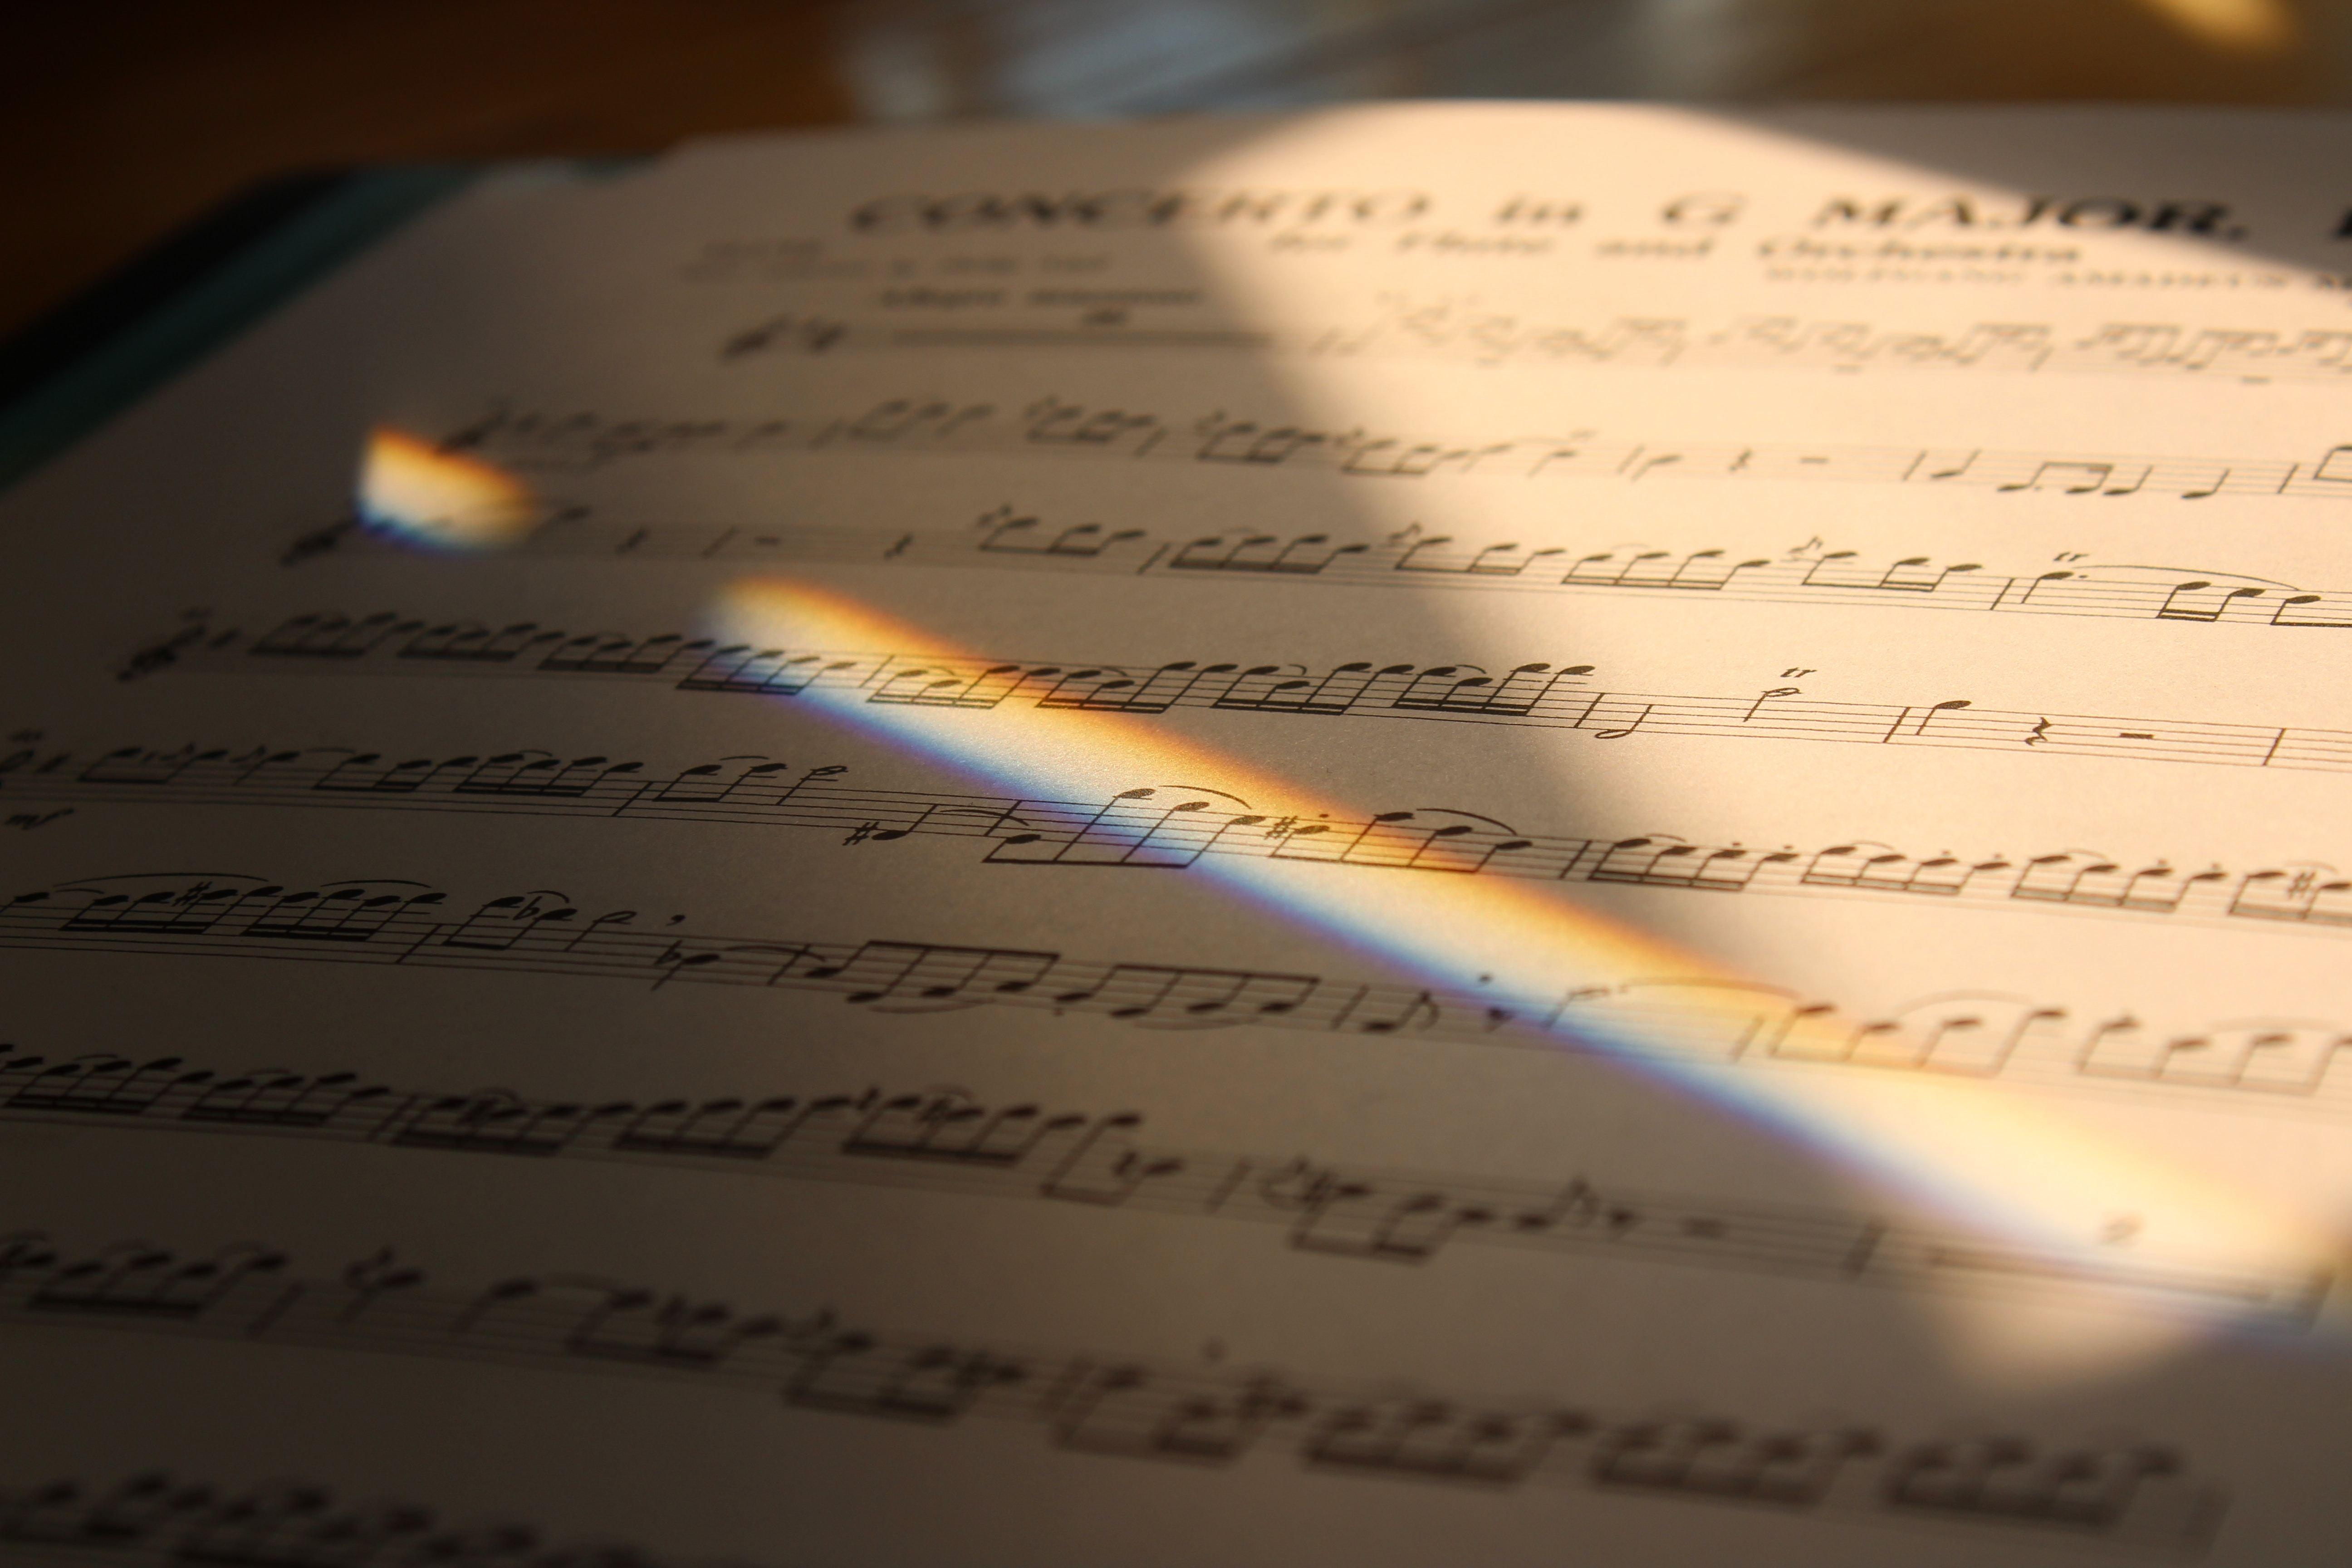 Sheet Music with rainbow light shining on it